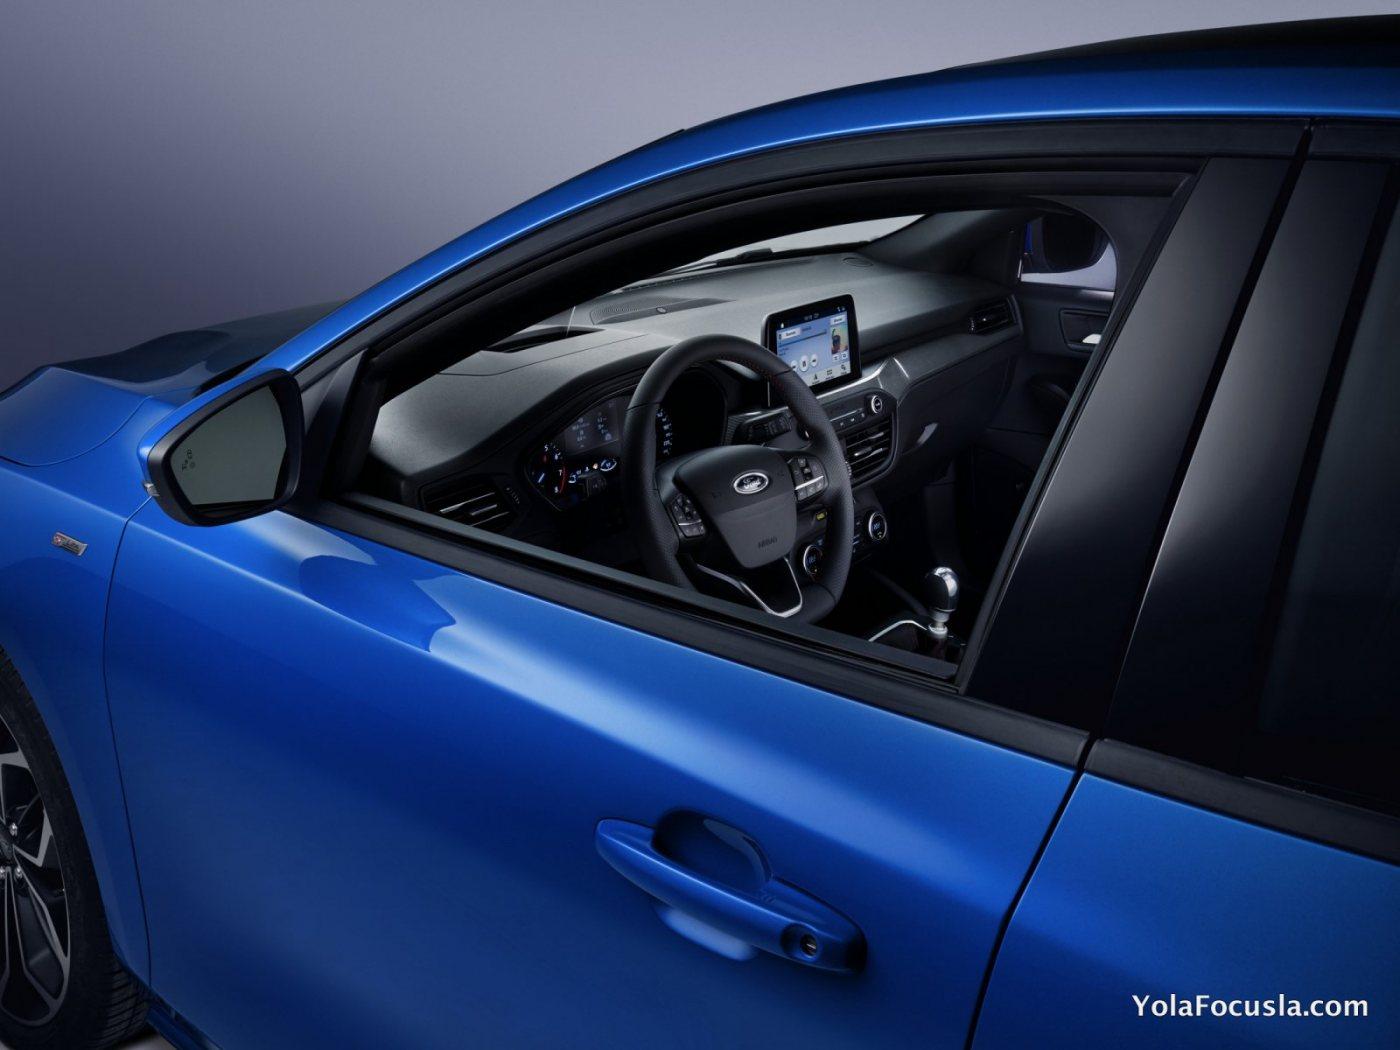 2018 Yeni Ford Focus Mk4_25.jpg